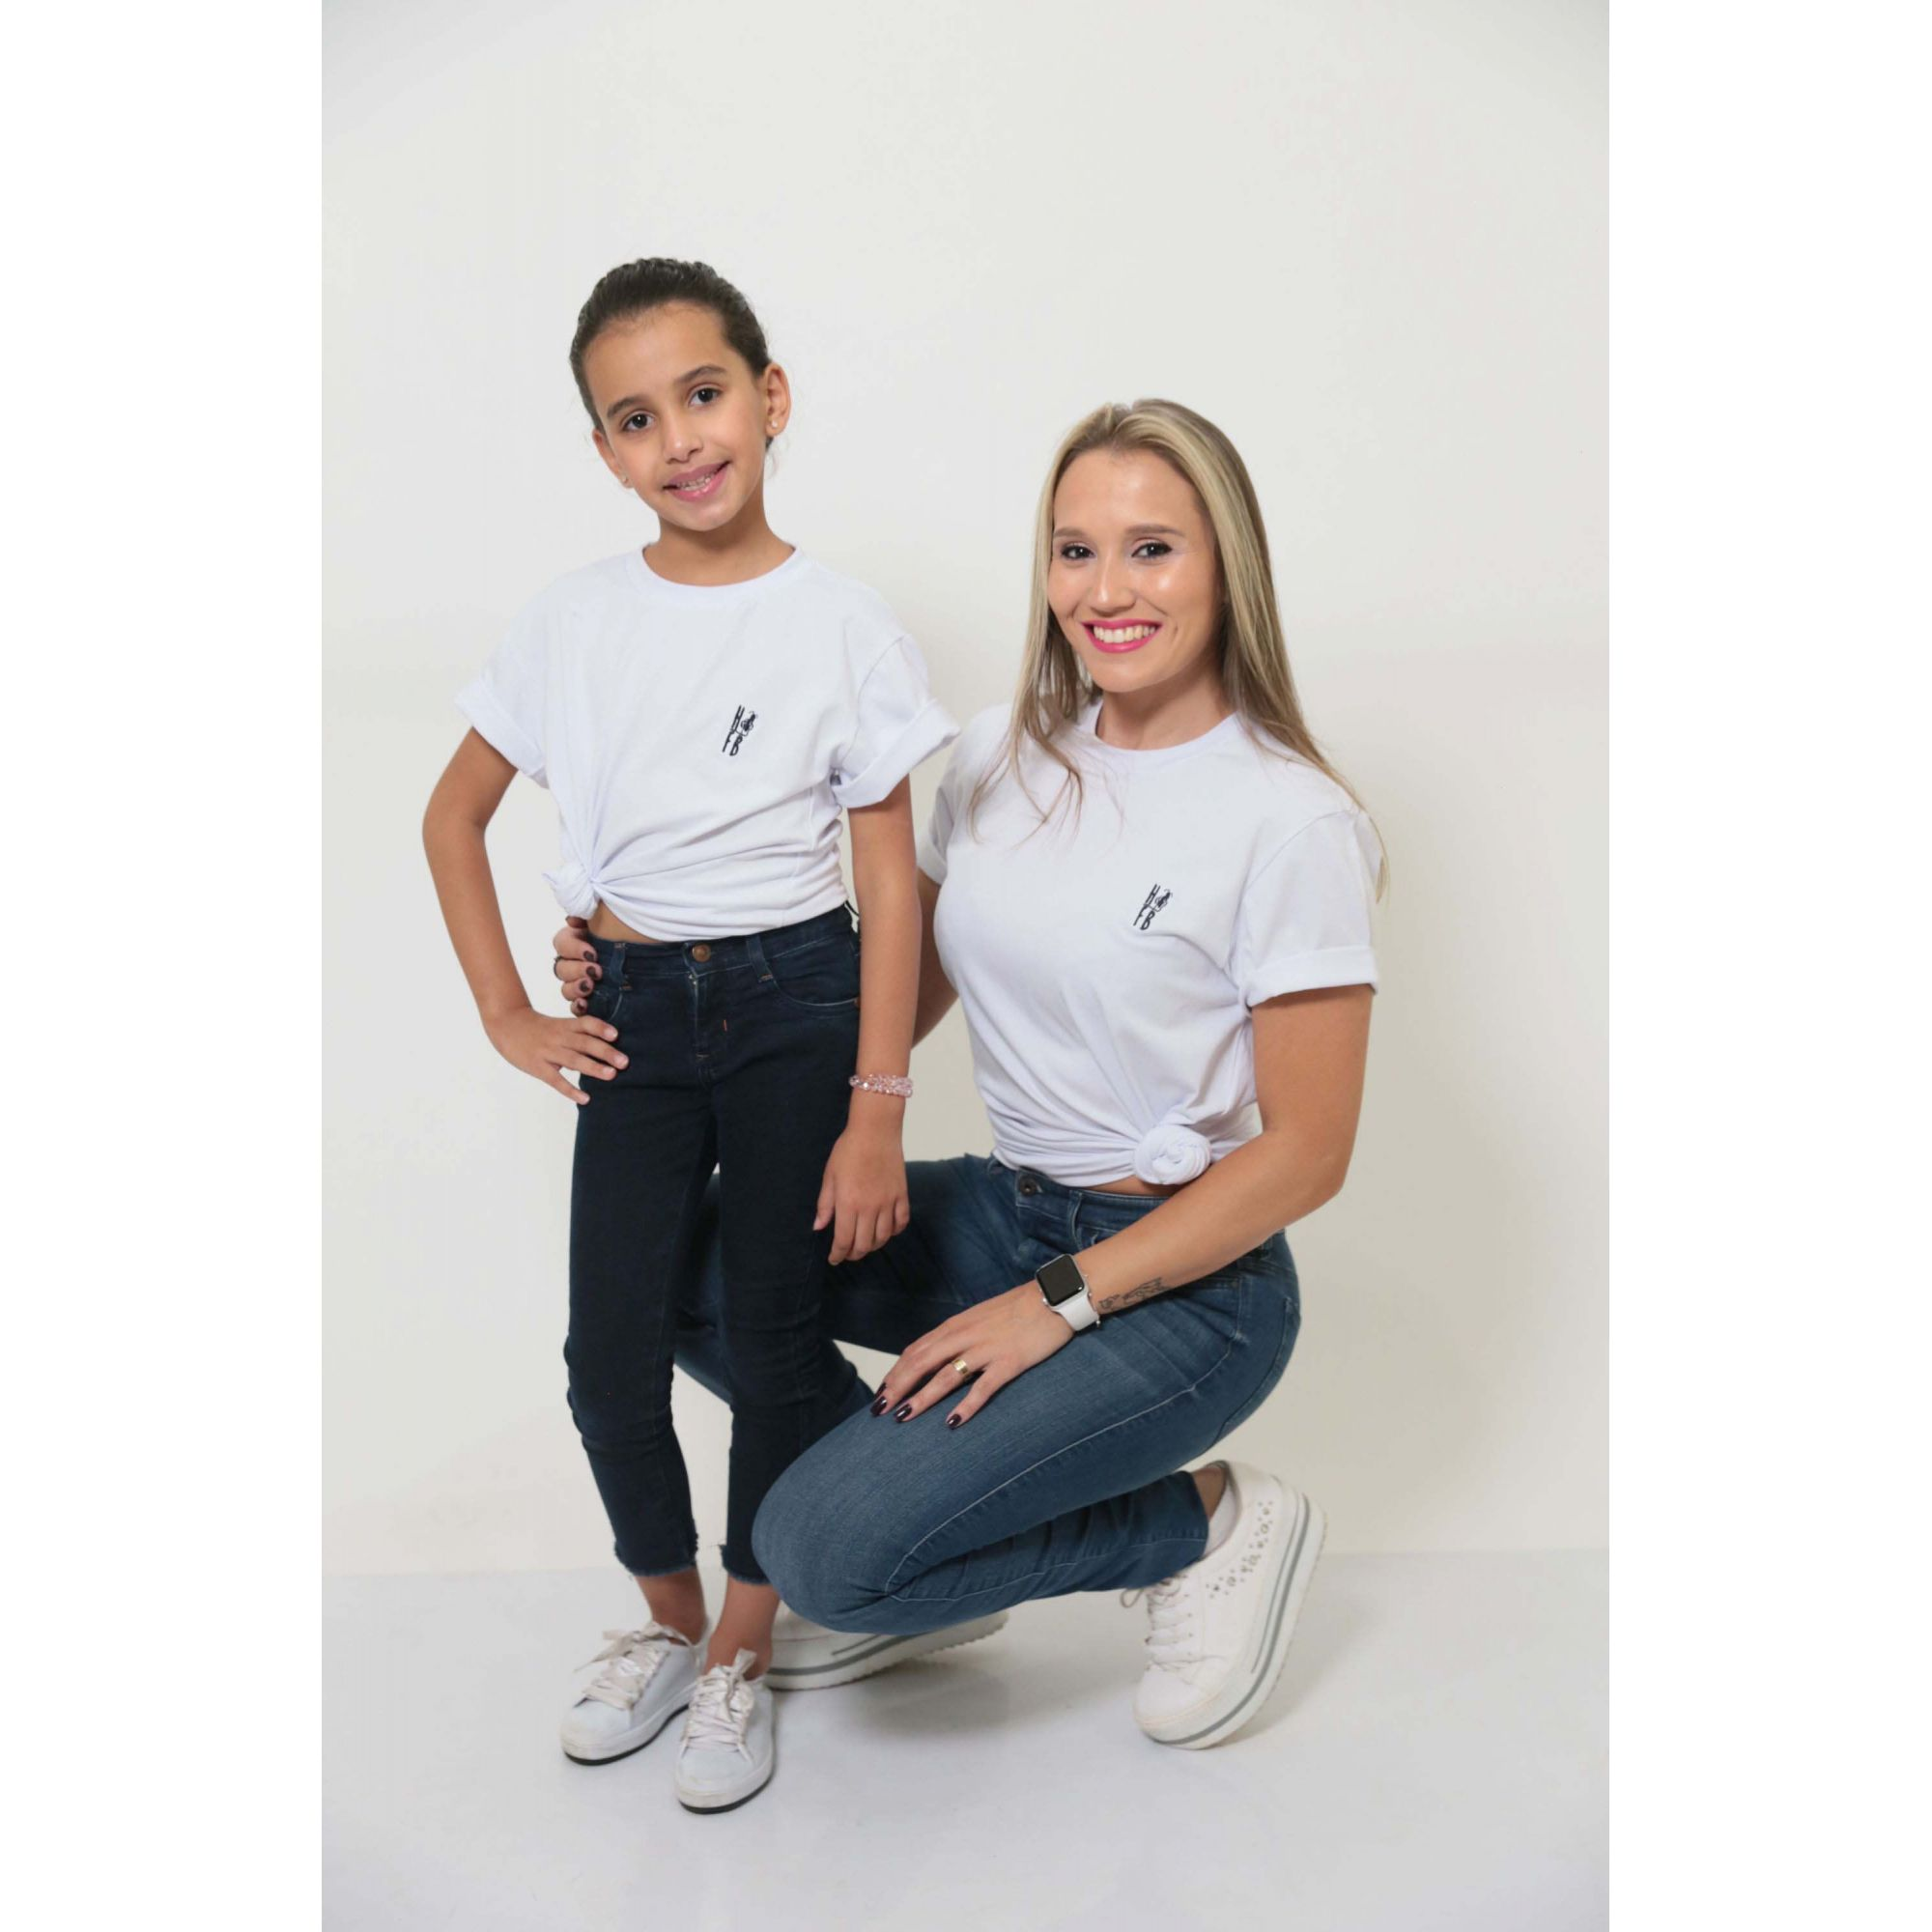 MÃE E FILHA > Kit 02 Peças T-Shirts - Branca Unissex [Coleção Tal Mãe Tal Filha]  - Heitor Fashion Brazil